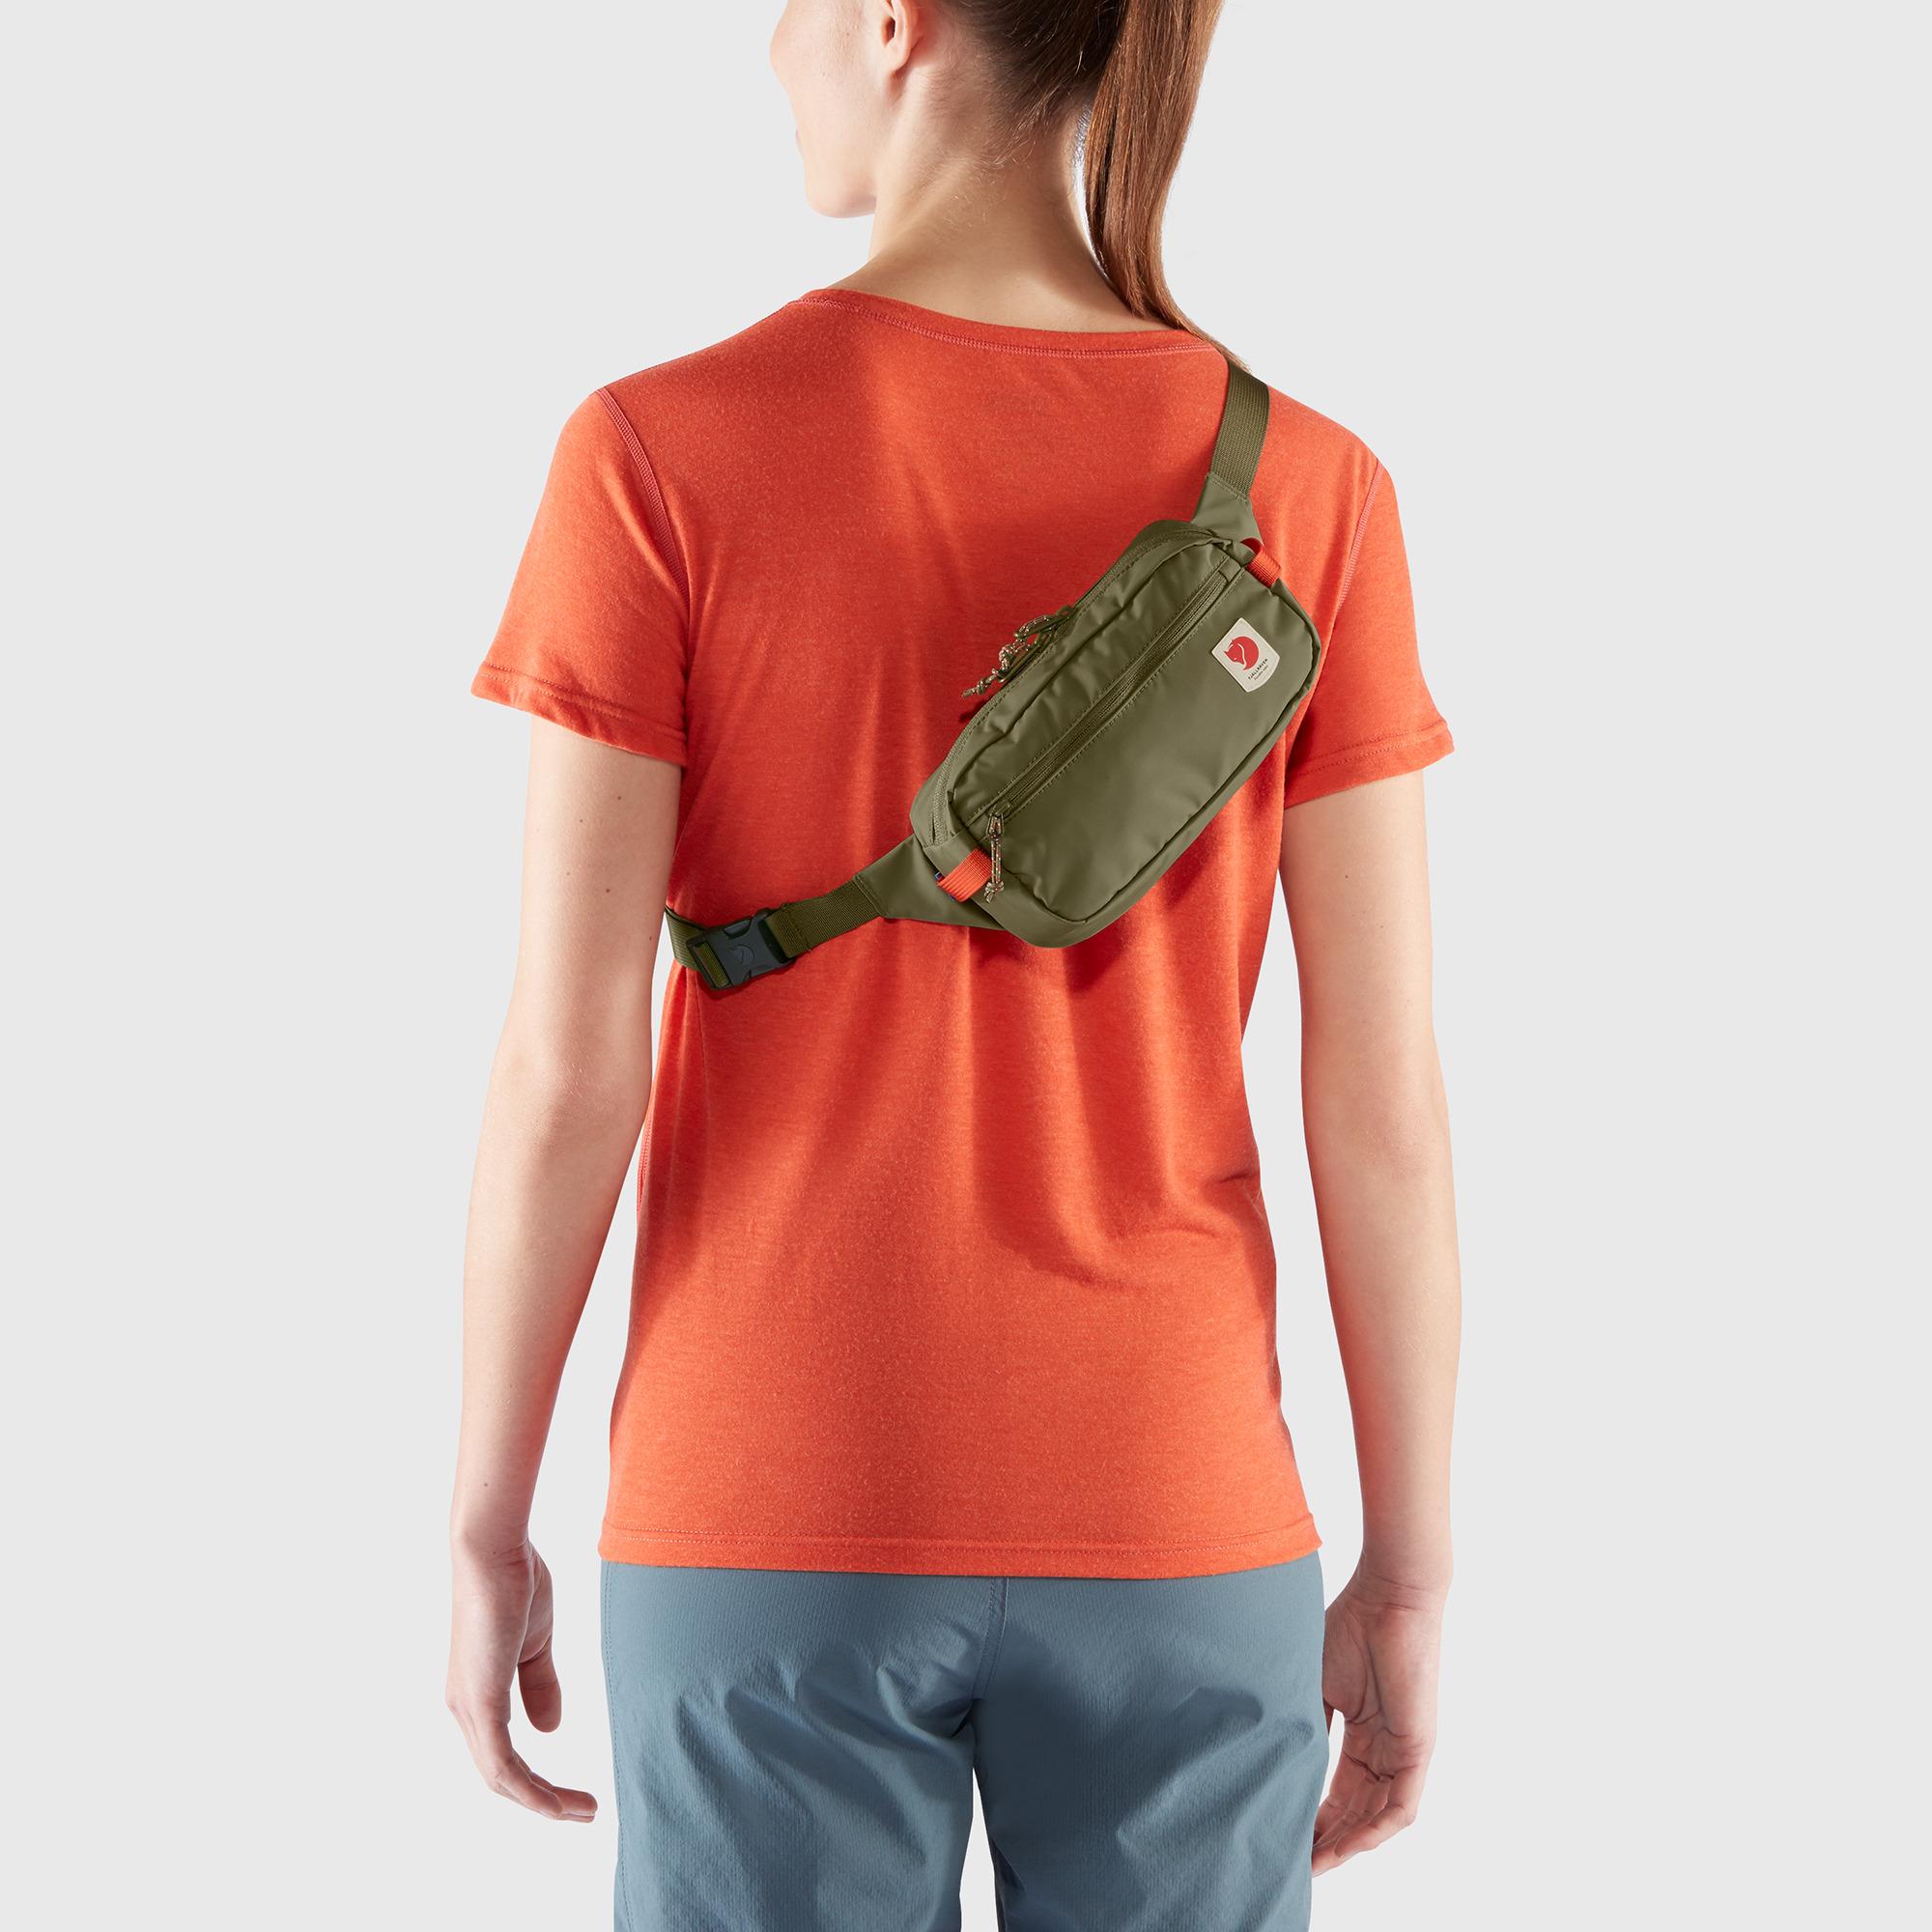 FJALLRAVEN High Coast Hip Pack Backpacks